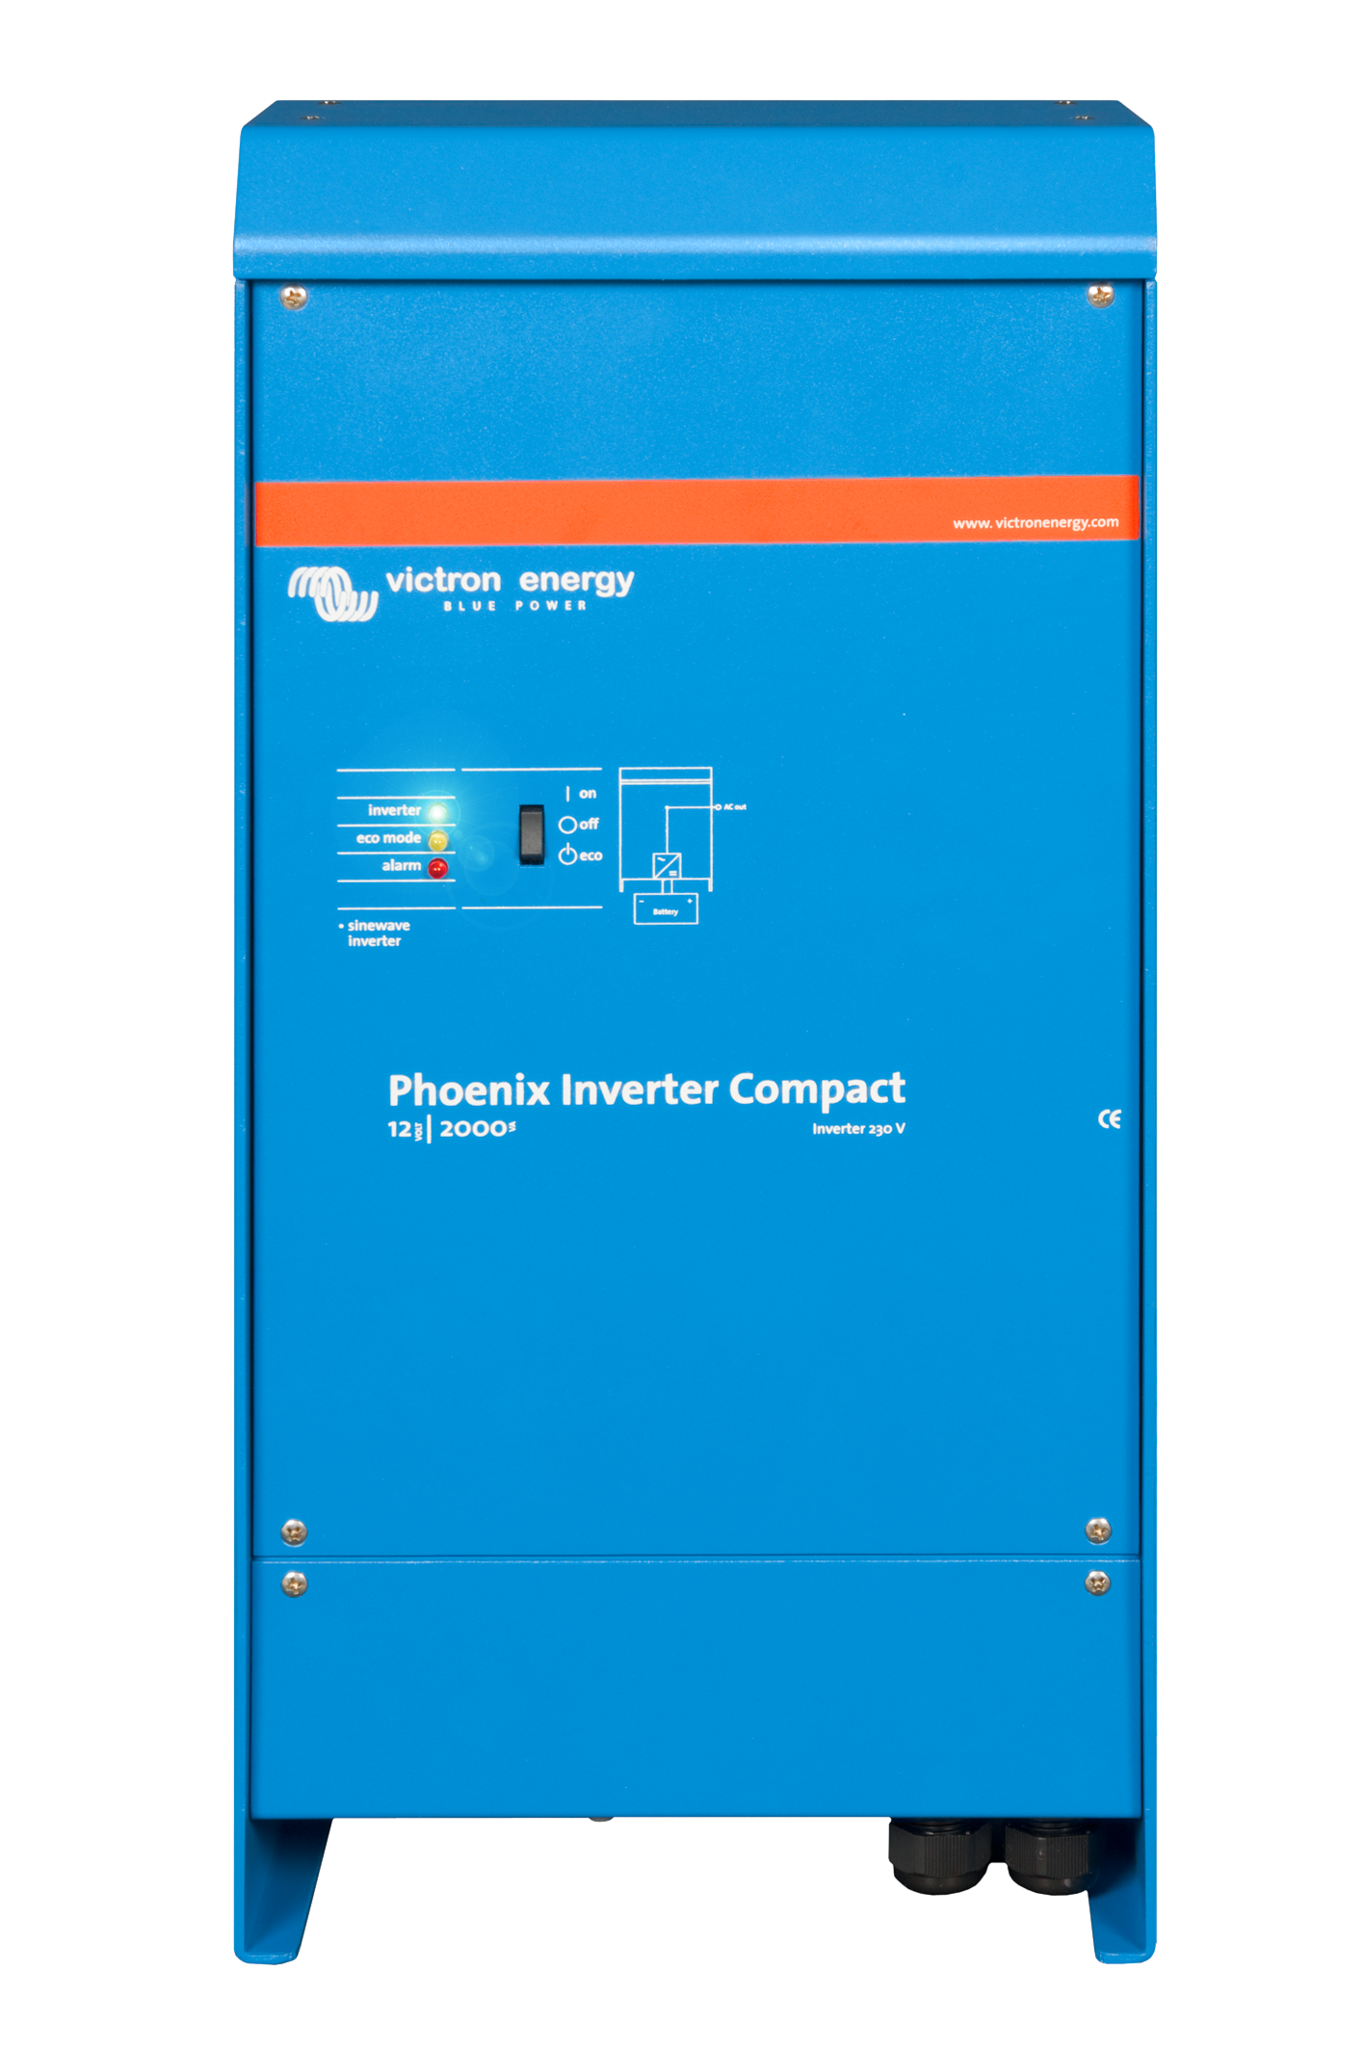 Victron Energy Phoenix Inverter Compact  12V